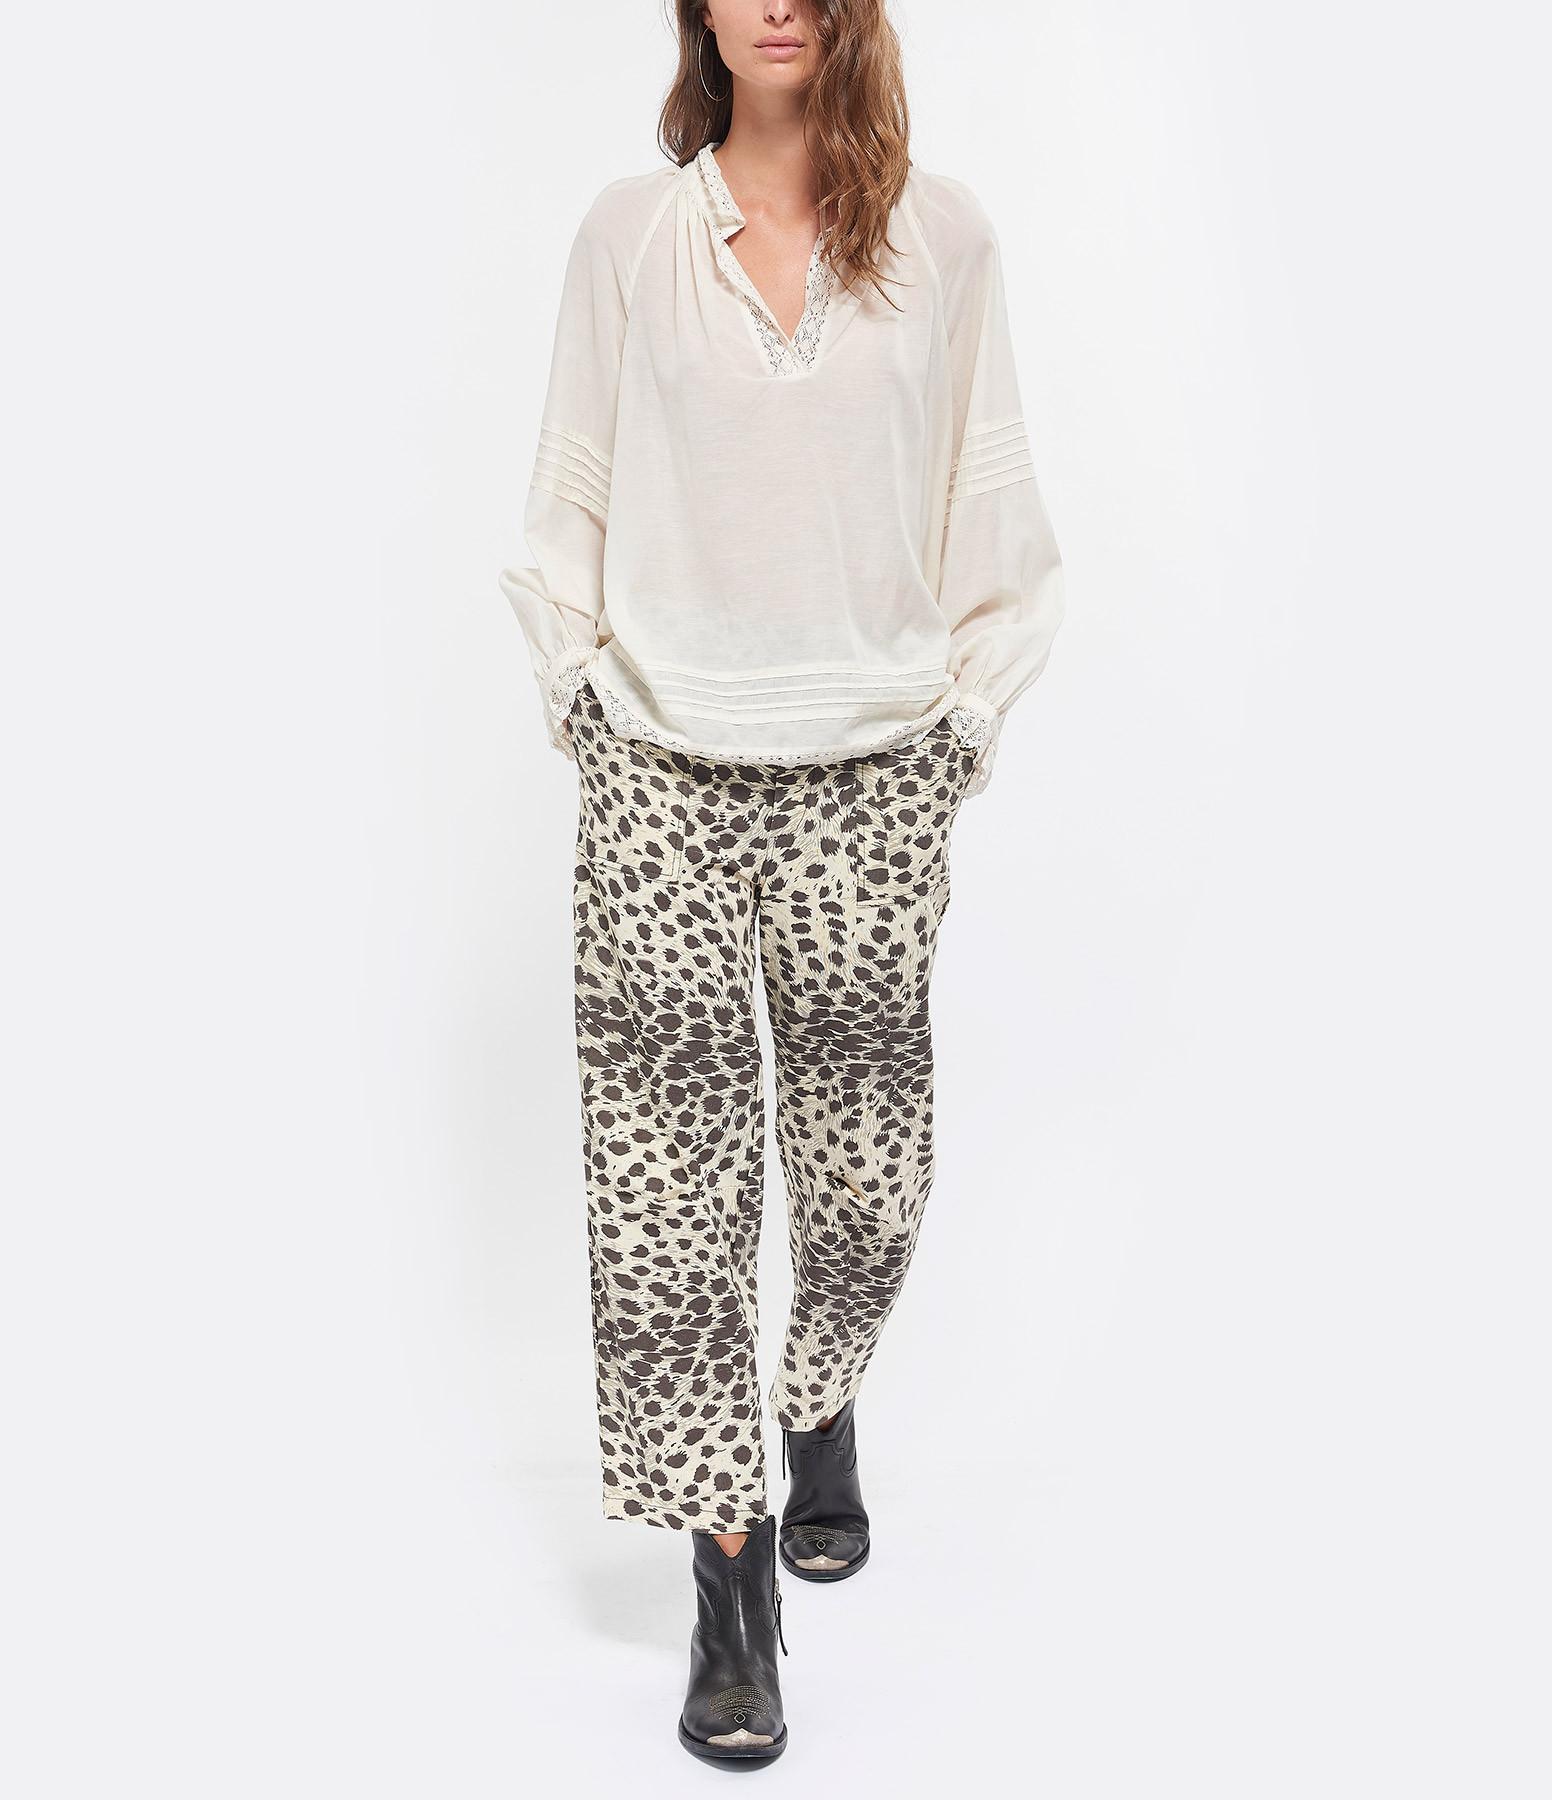 SEA NEW YORK - Pantalon Coton Léopard Naturel